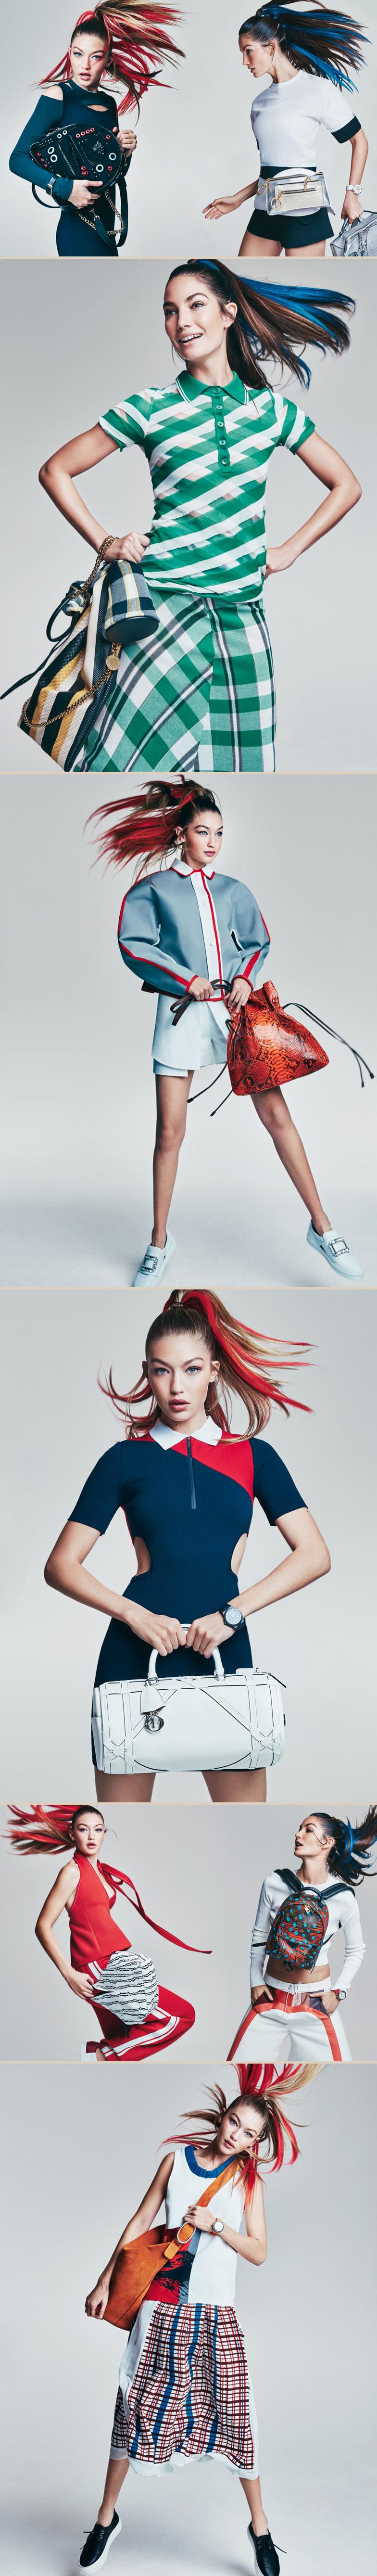 Young Energy - Cleon Gostinski - Fonte Fashion House Global